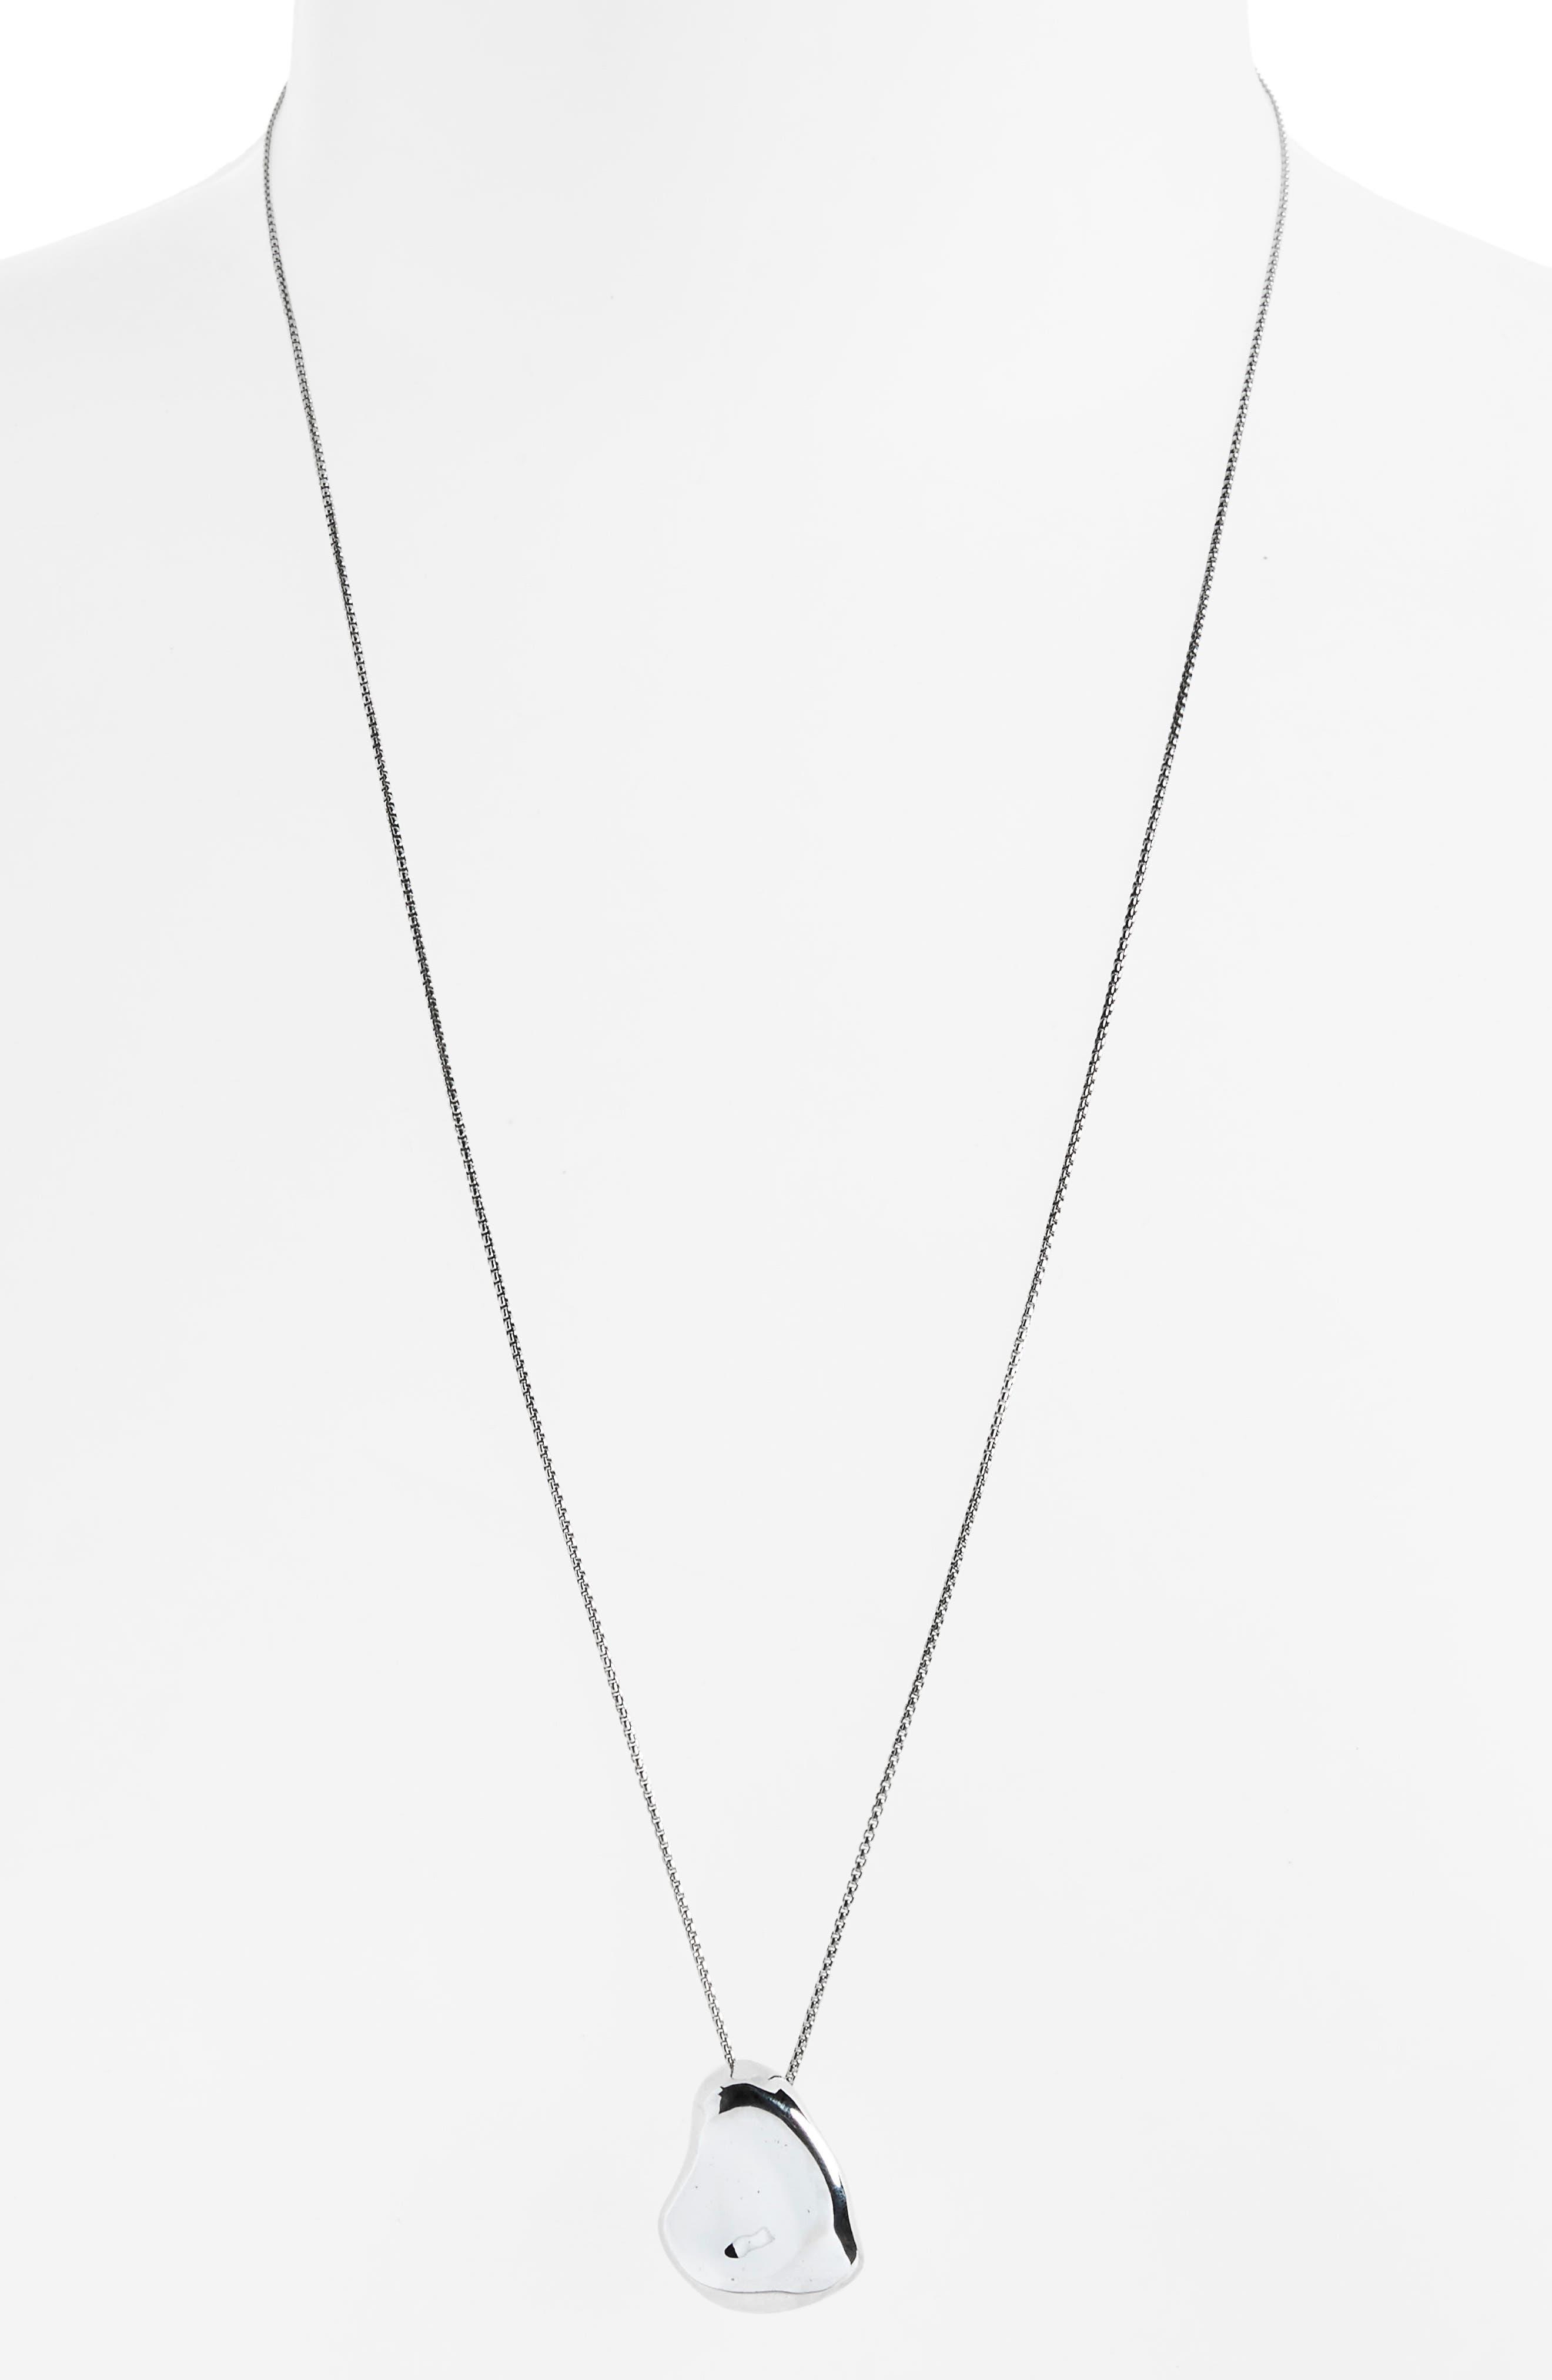 Nug Pendant Necklace,                             Alternate thumbnail 2, color,                             STERLING SILVER